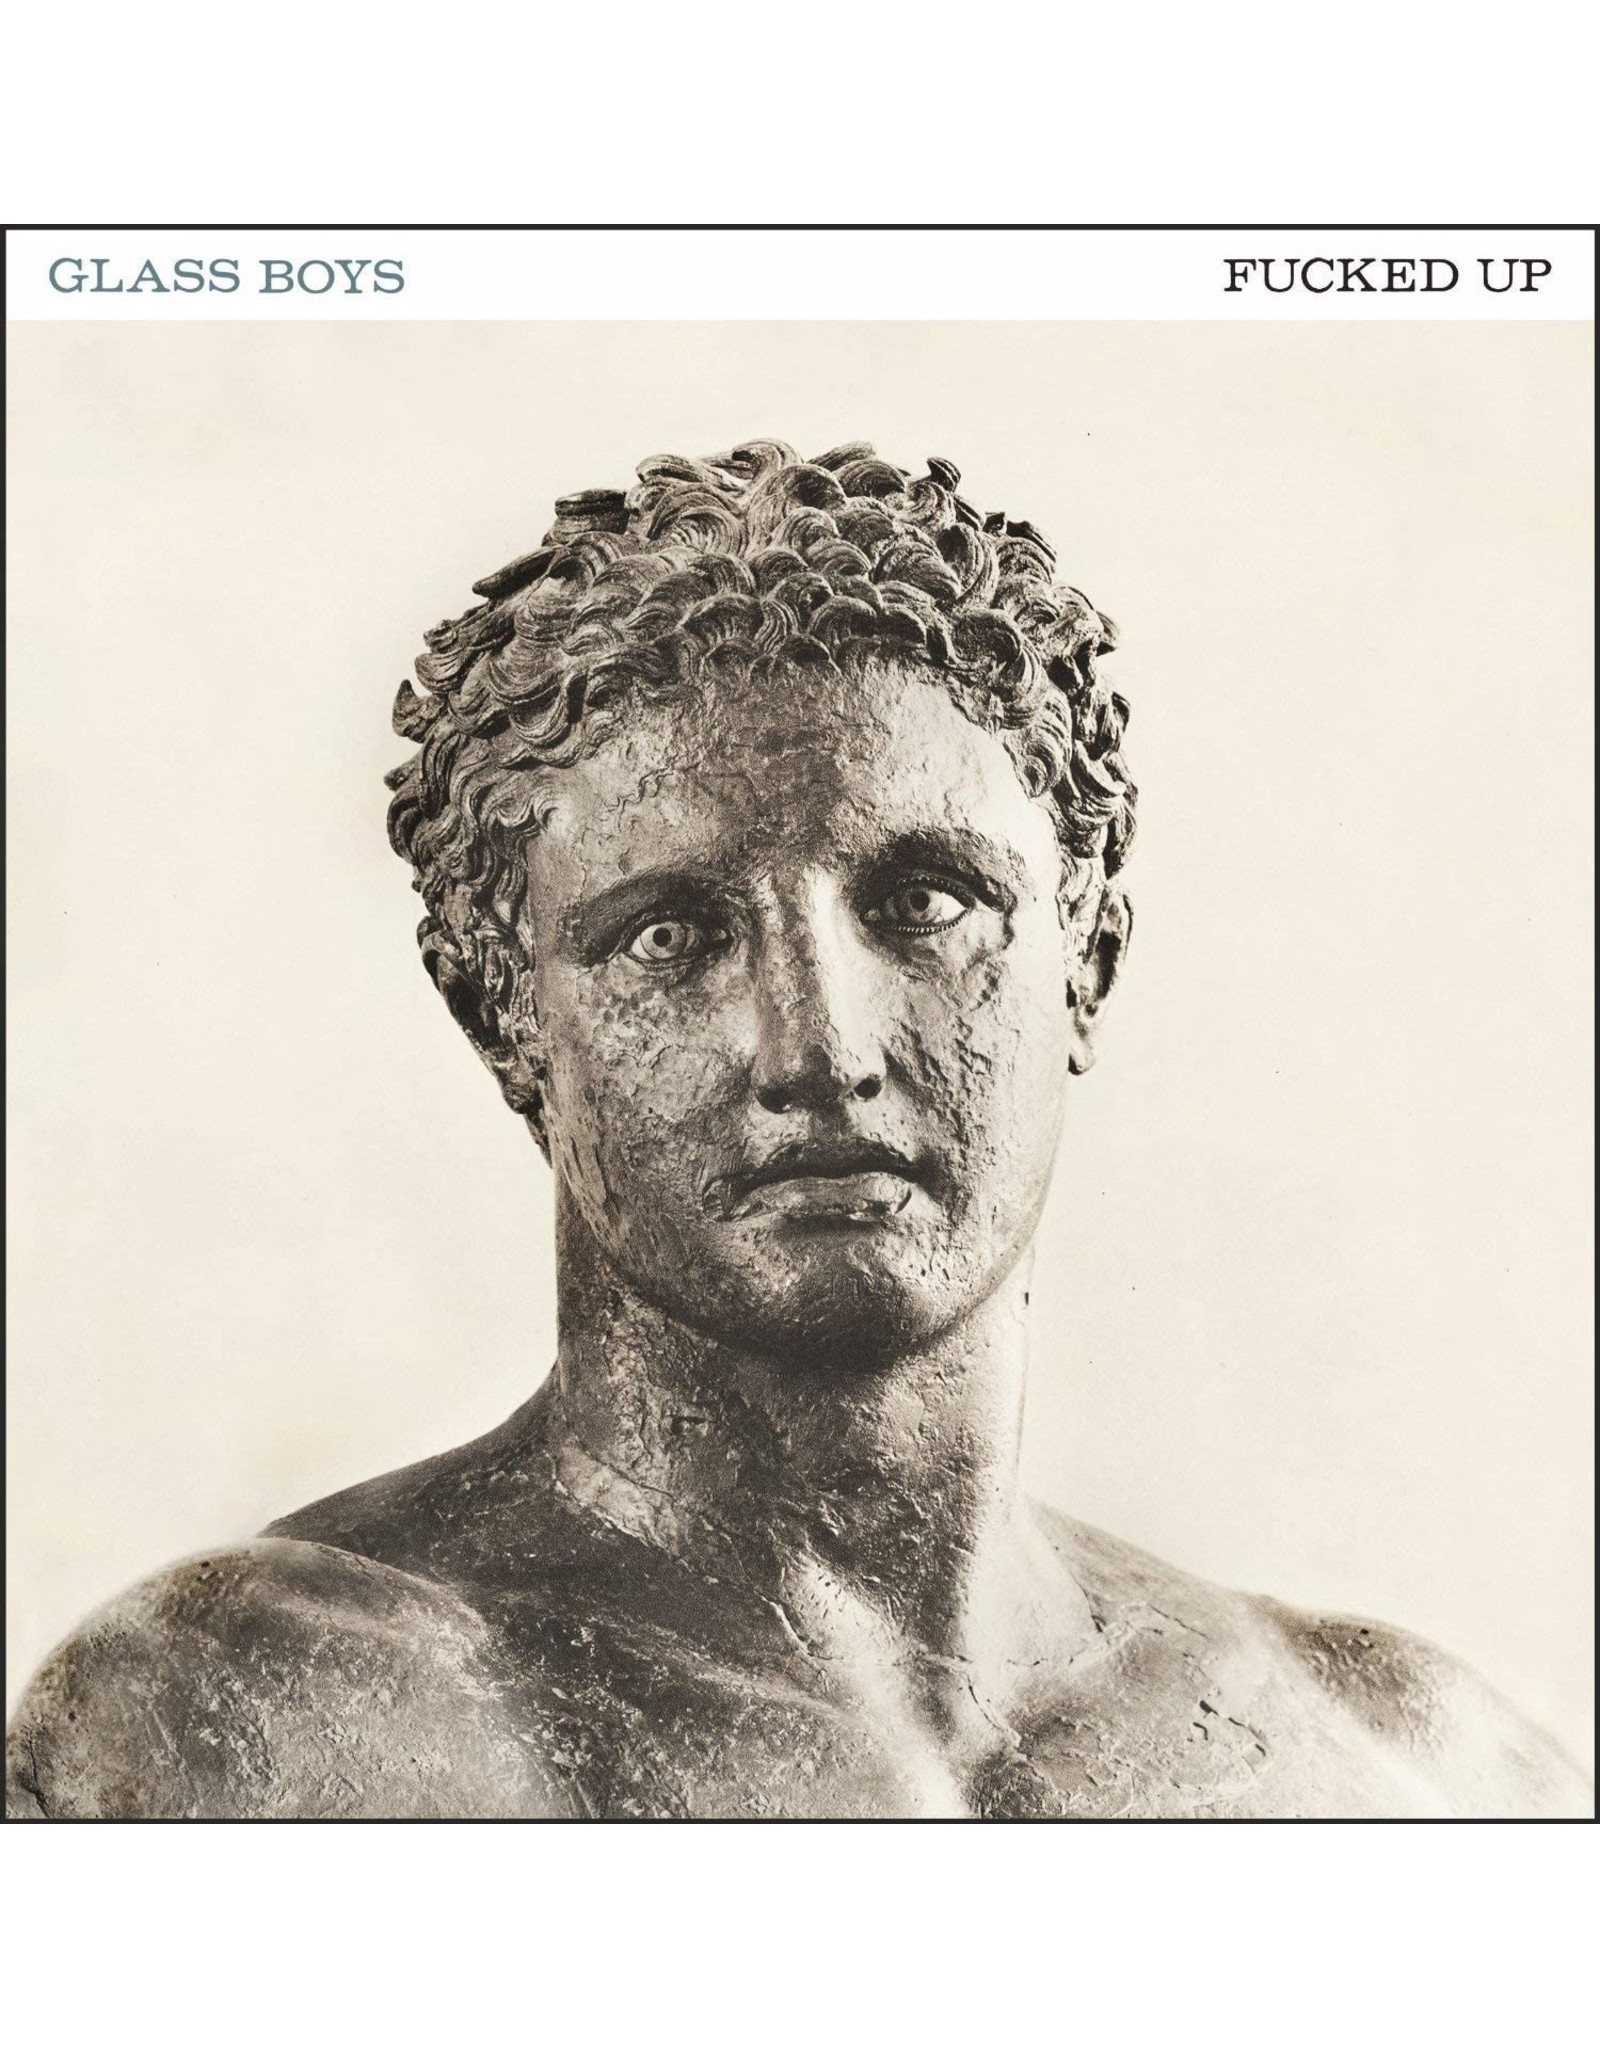 Fucked Up - Glass Boys